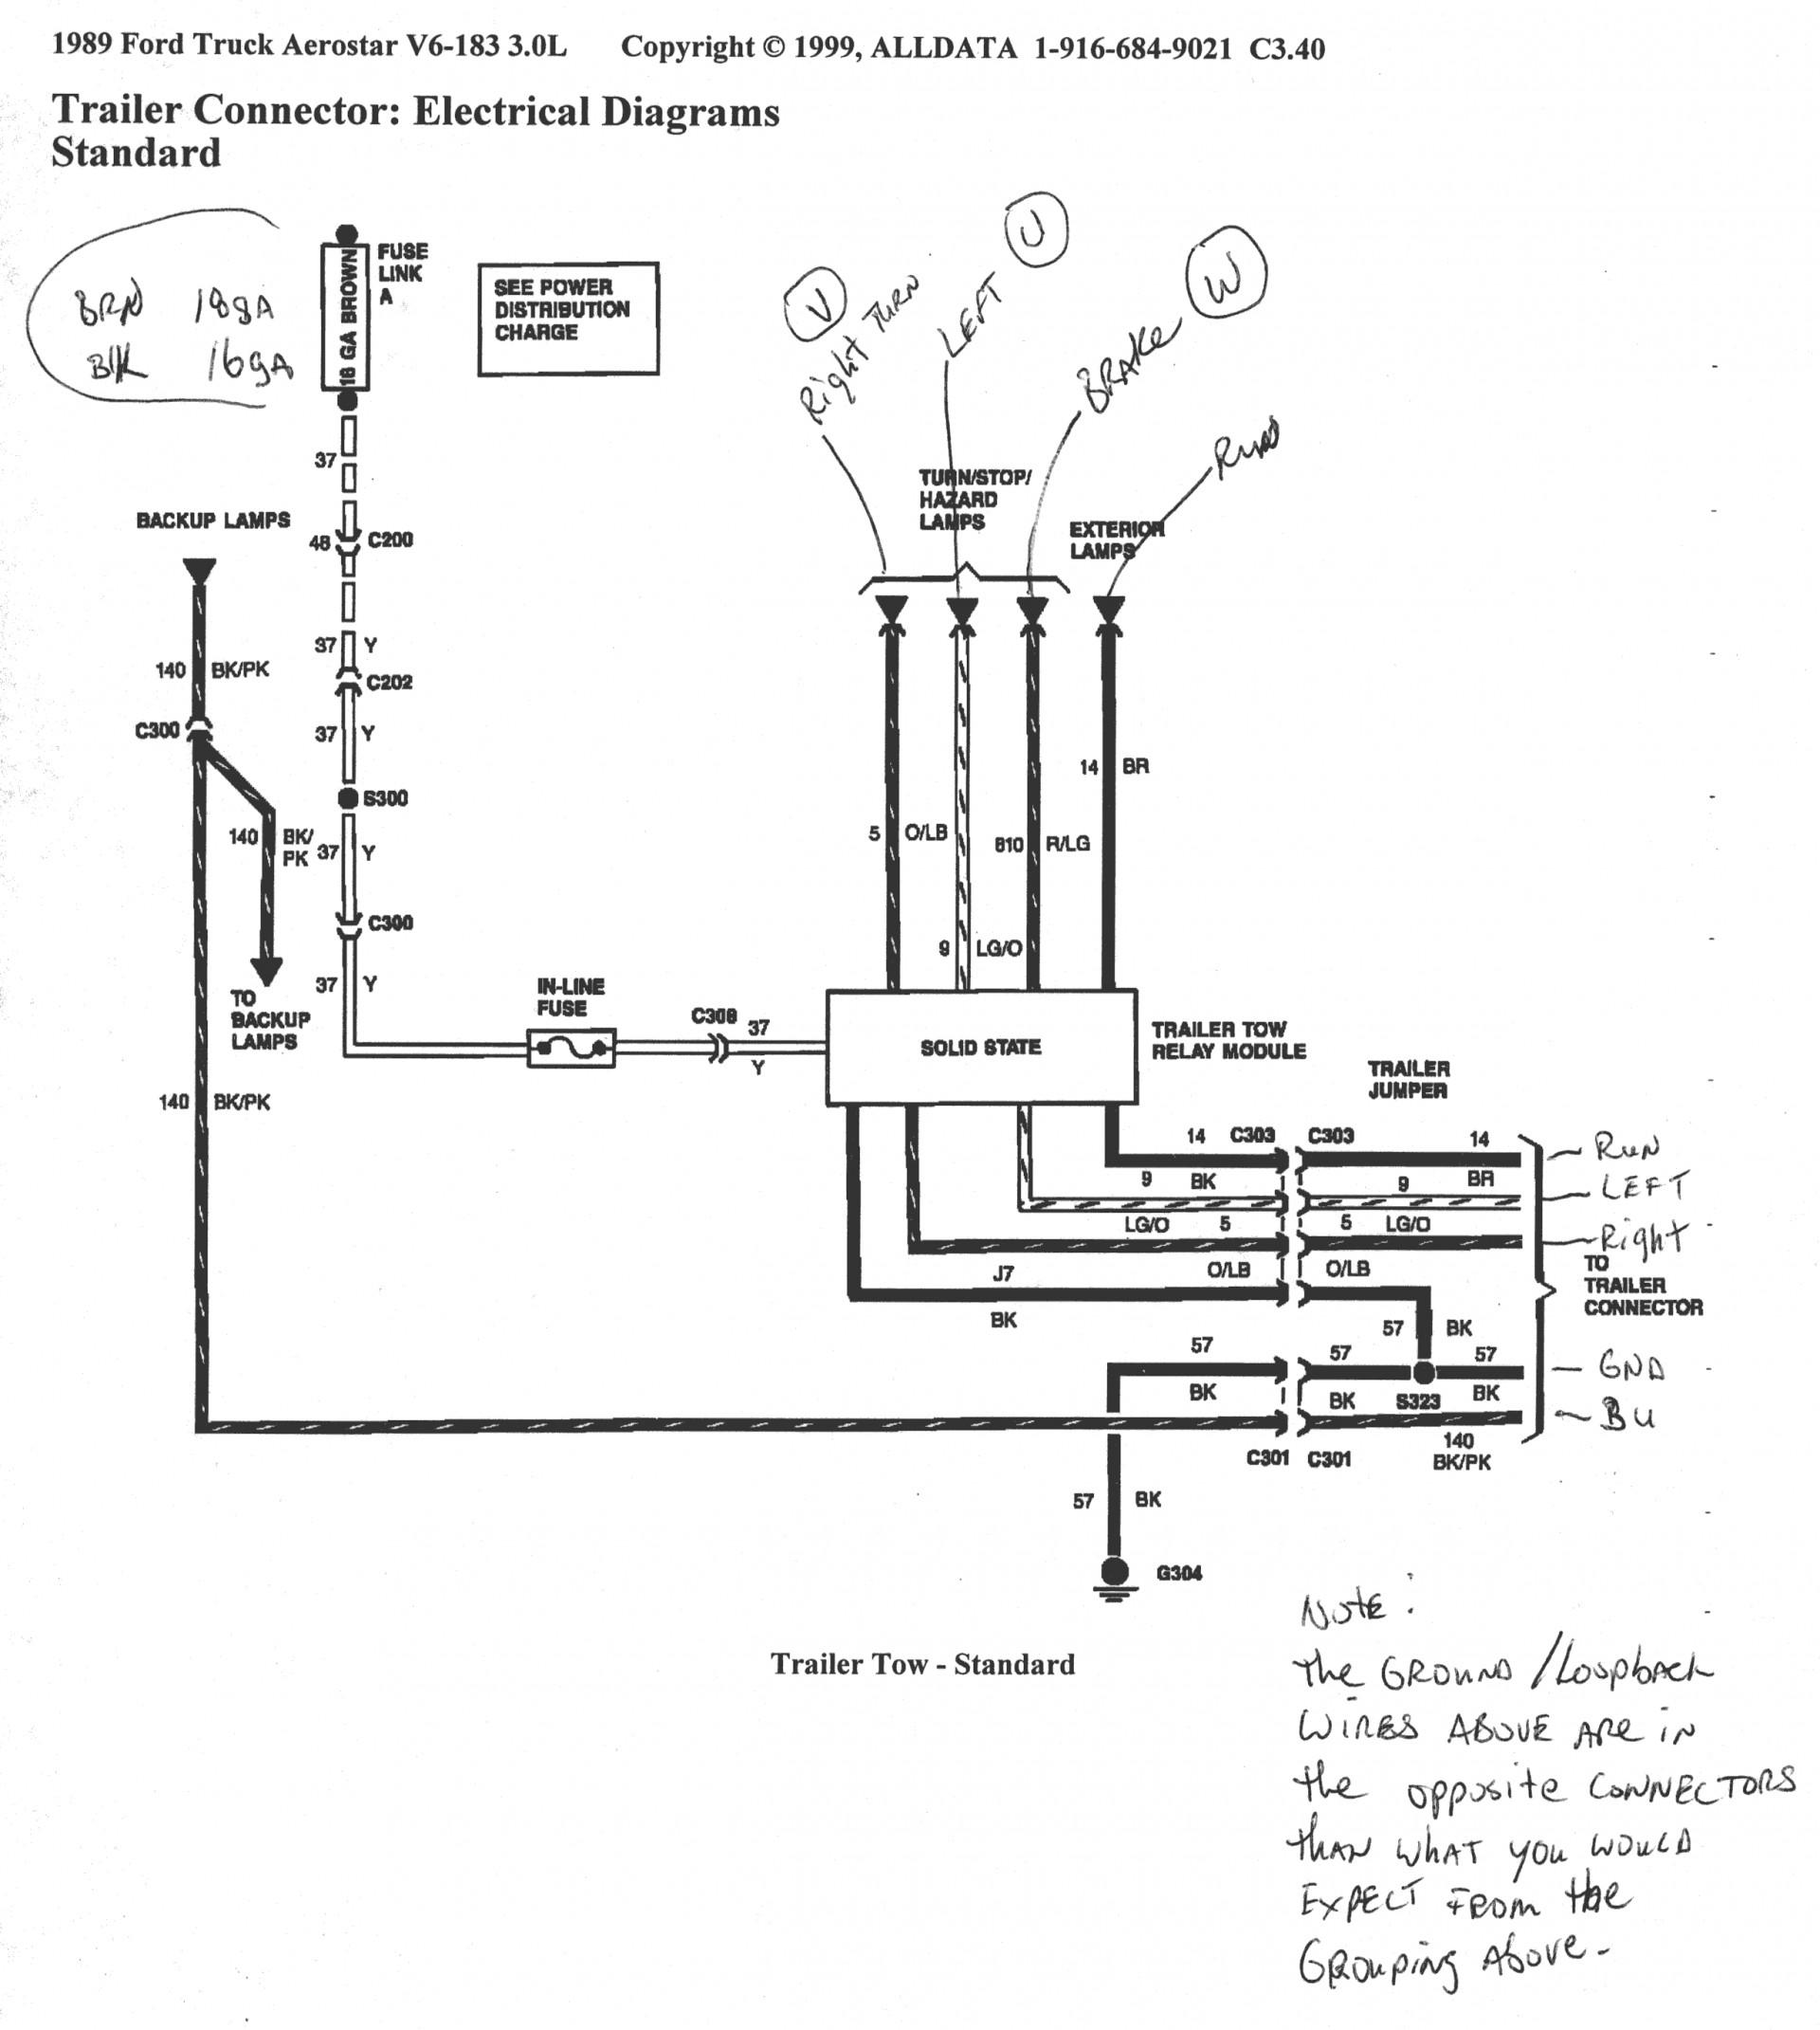 Car Trailer Plug Wiring Diagram Wire Trailer Plug Wiring Diagram Pin N Type Insidel Light Fair 7 Of Car Trailer Plug Wiring Diagram